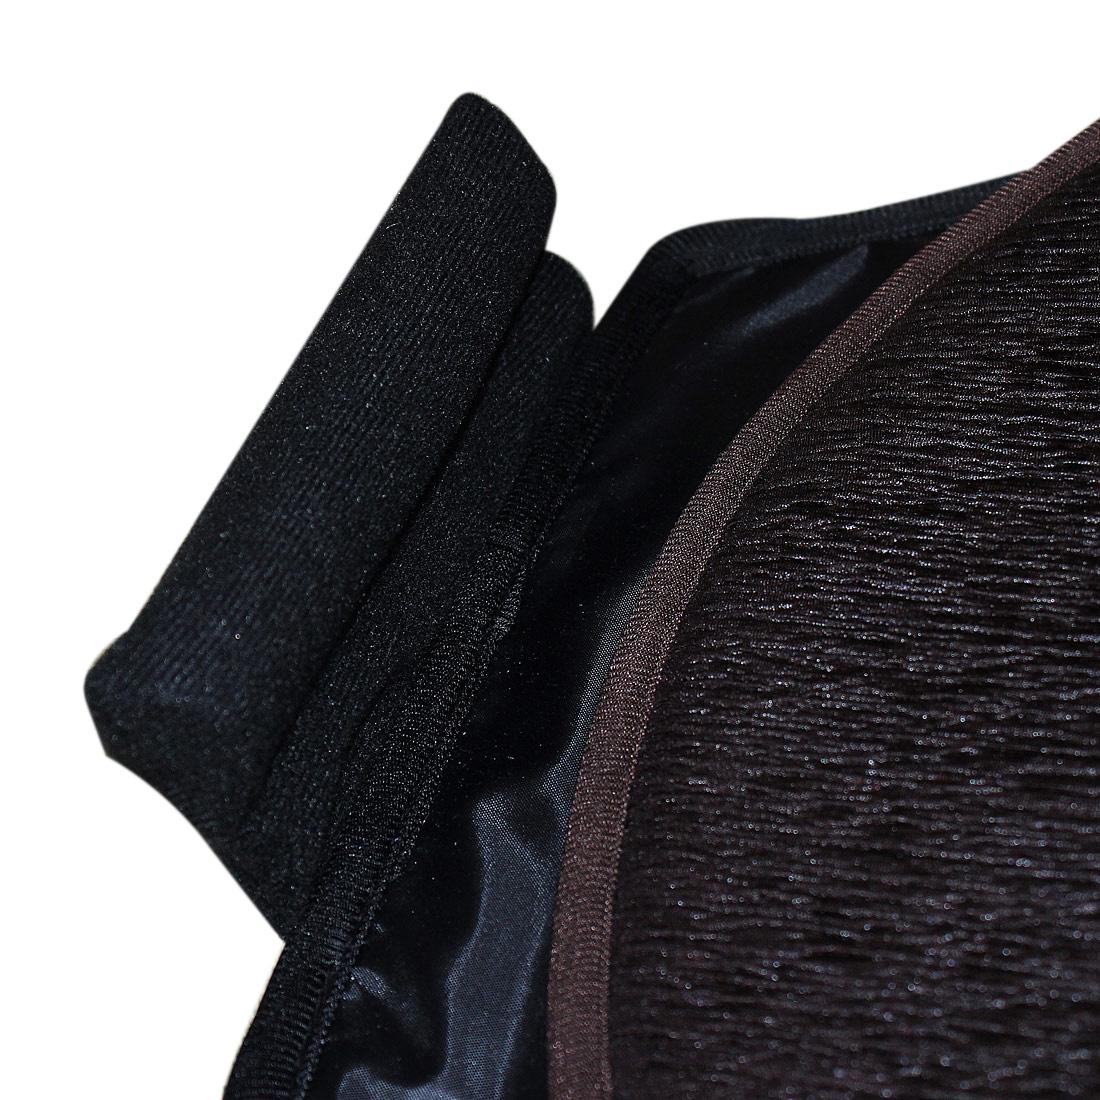 revolving chair repair in jaipur modern egg car seat rotating cushion swivel foam mobility